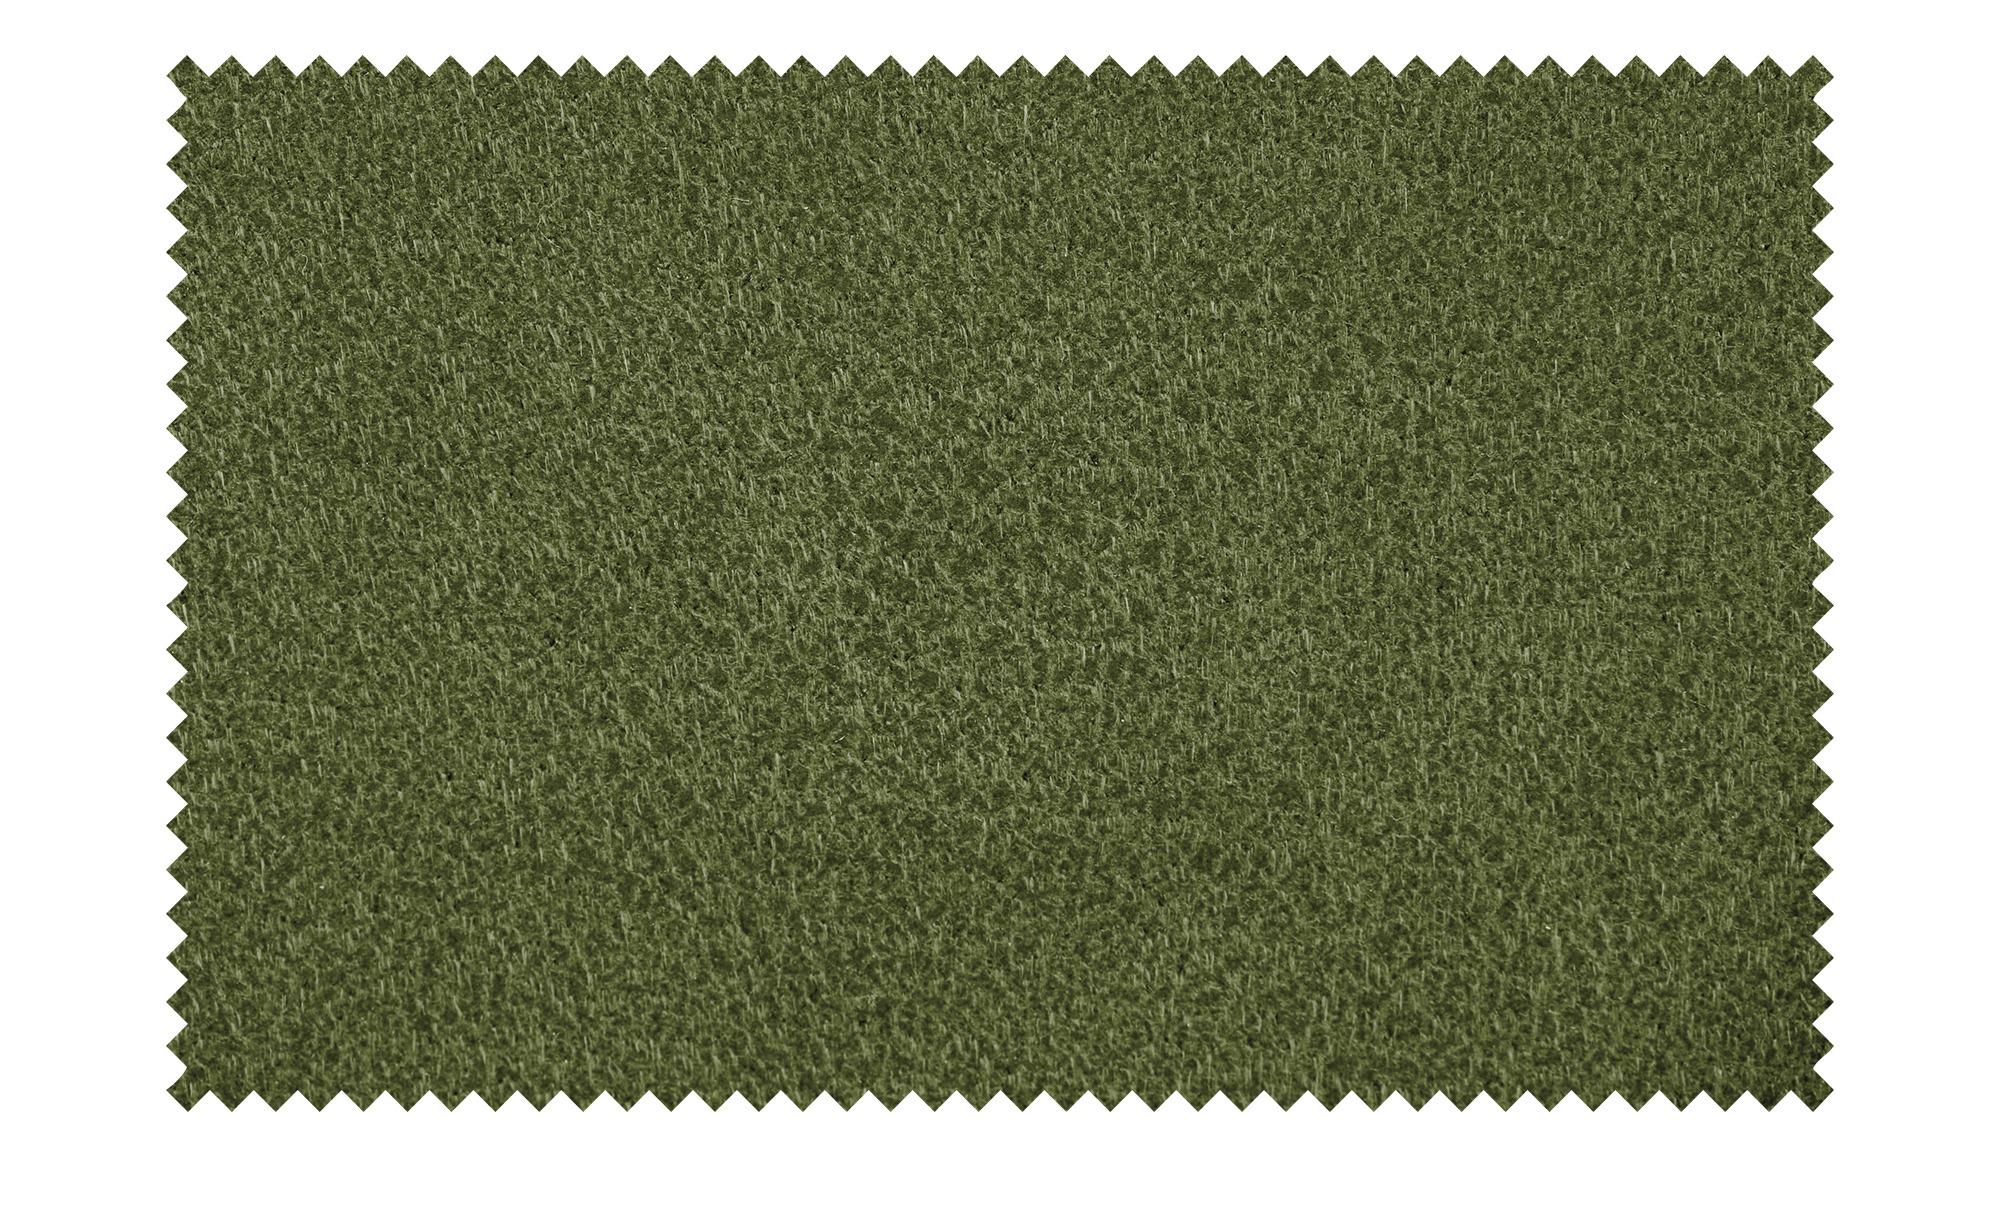 Wohnwert Ecksofa grün - Mikrofaser Indra ¦ grün ¦ Maße (cm): H: 81 Polstermöbel > Sofas > Ecksofas - Höffner